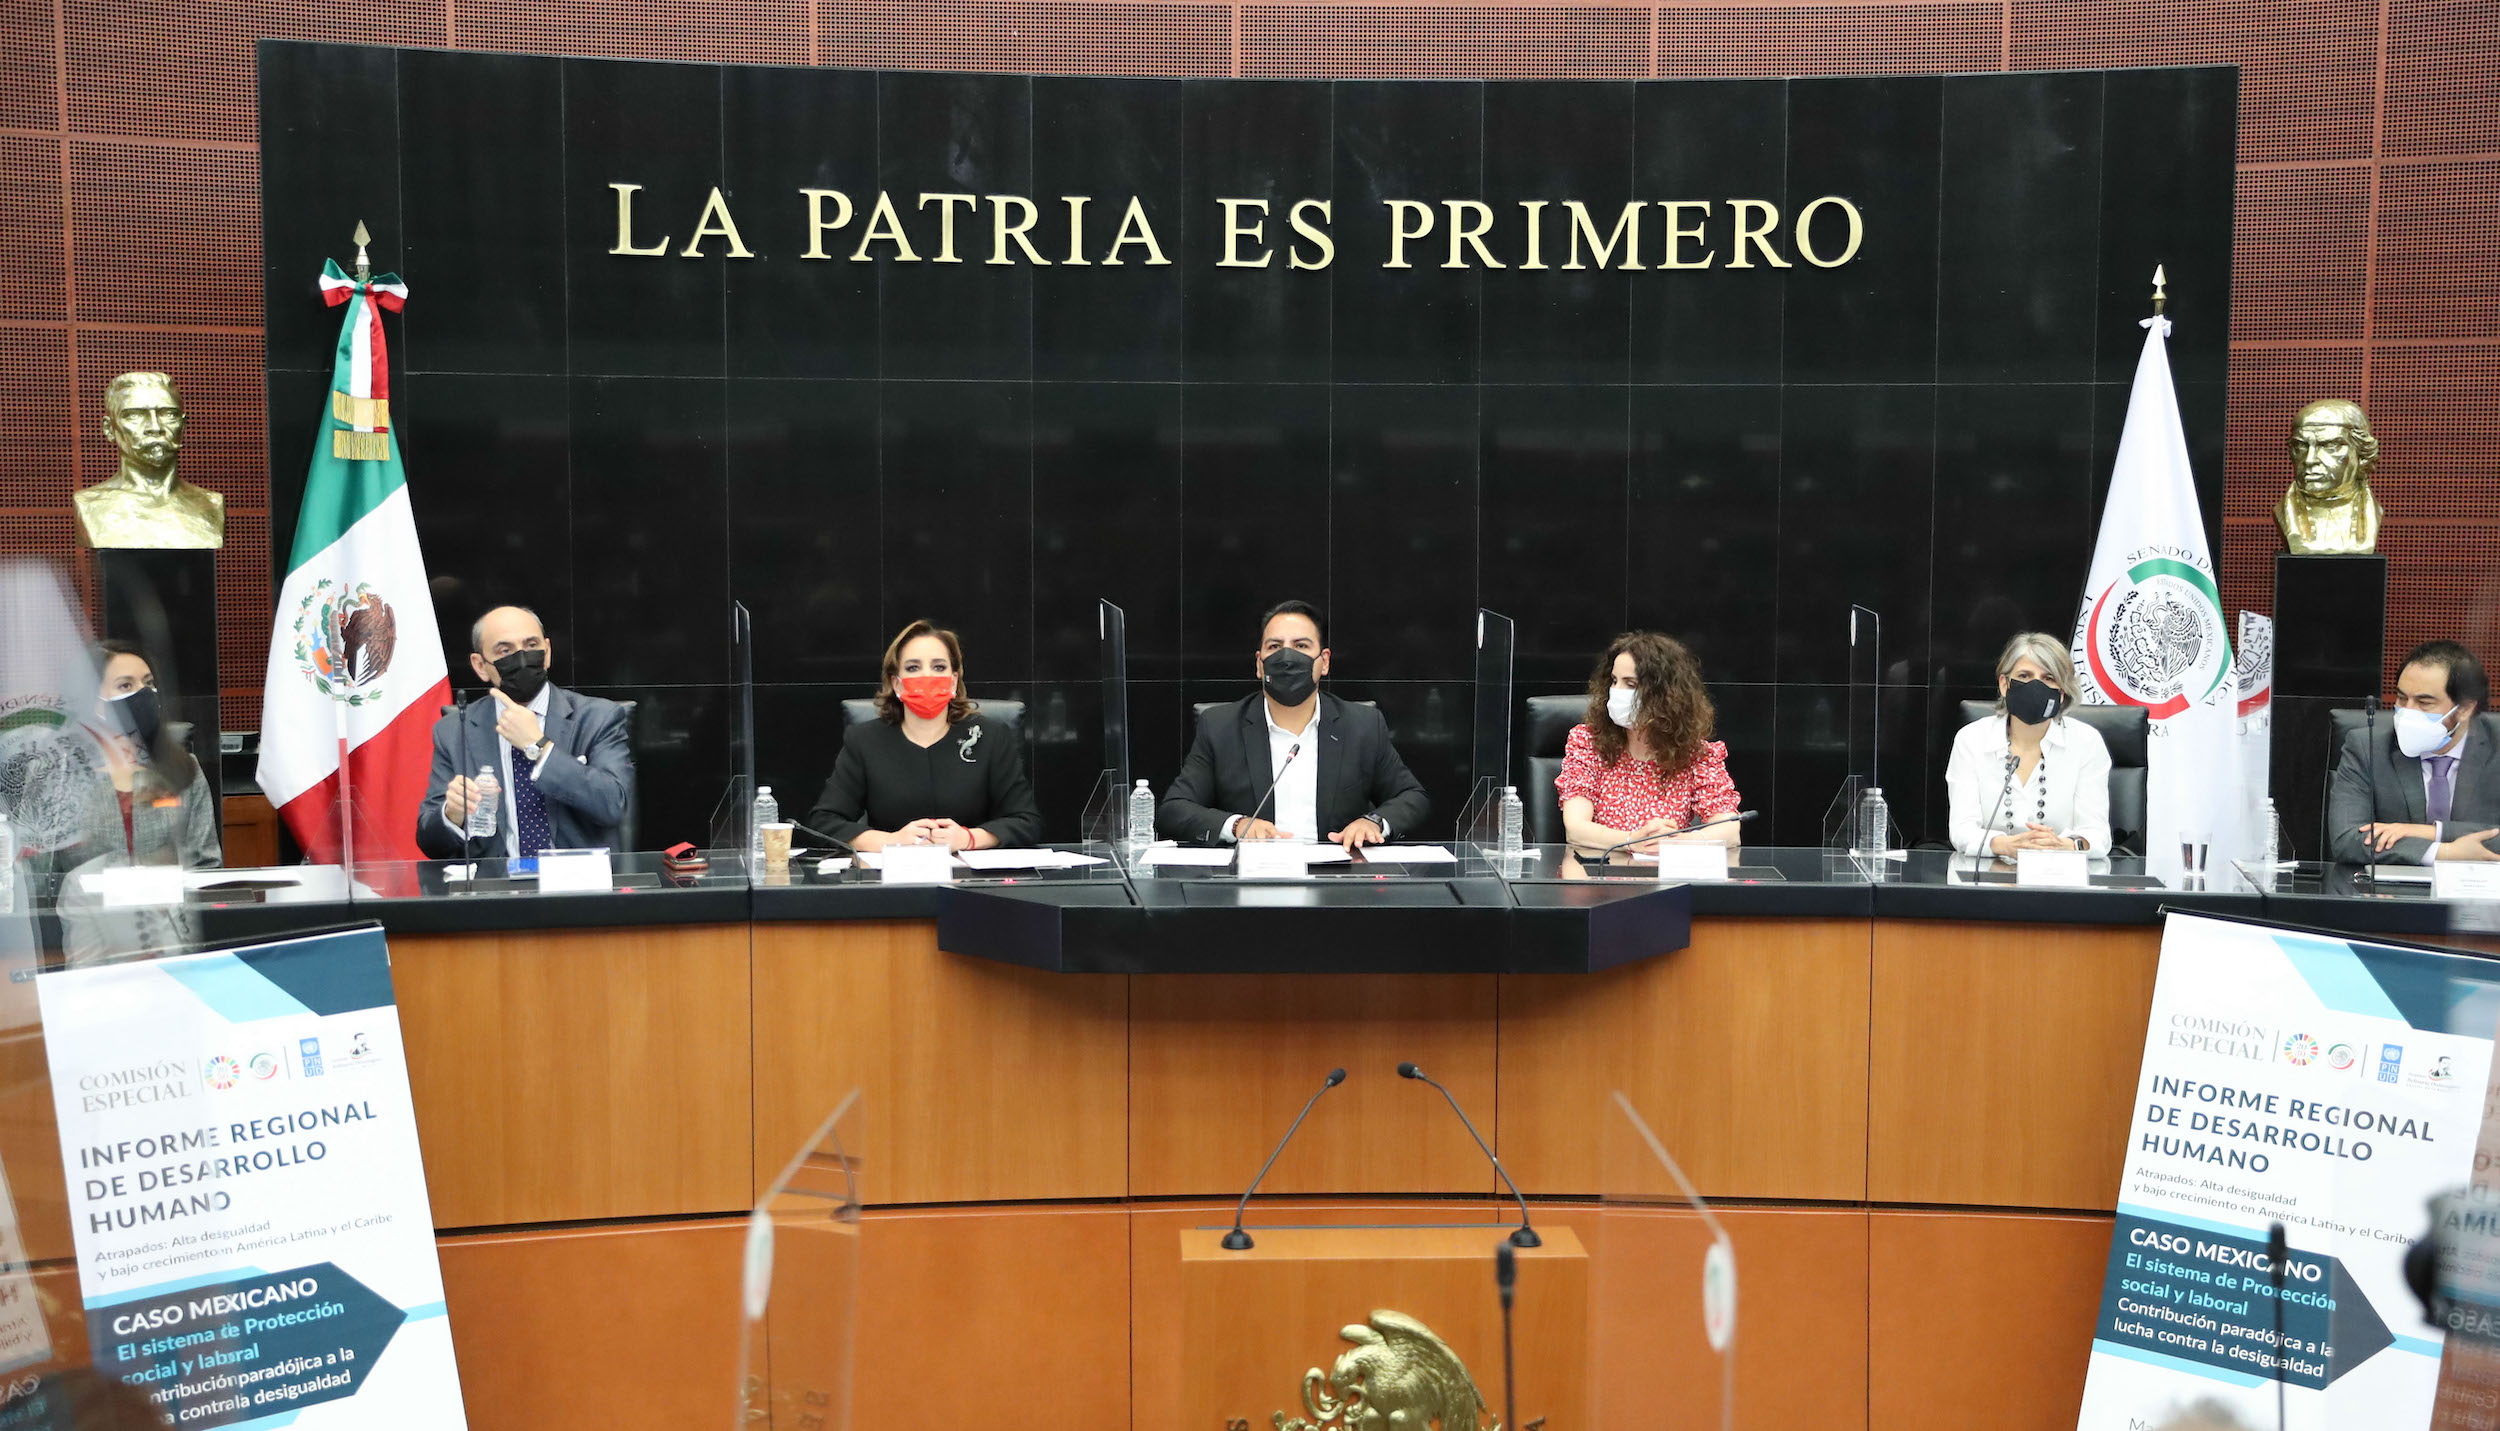 Senado preve periodo extraordinario para discutir revocacion de mandato mexico politico